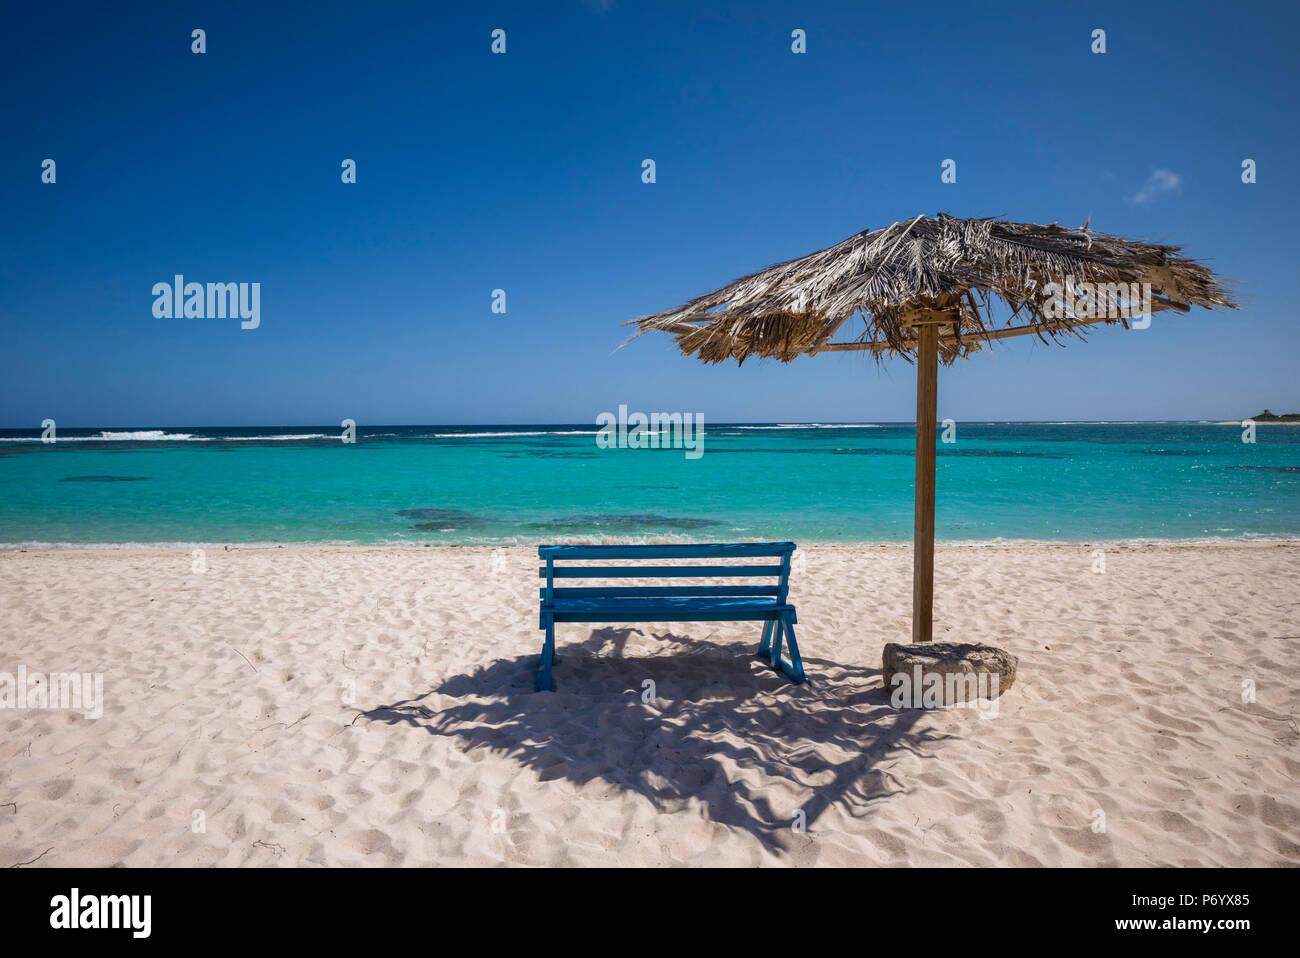 British Virgin Islands, Anegada, Loblolly Bay Beach, beach view - Stock Image